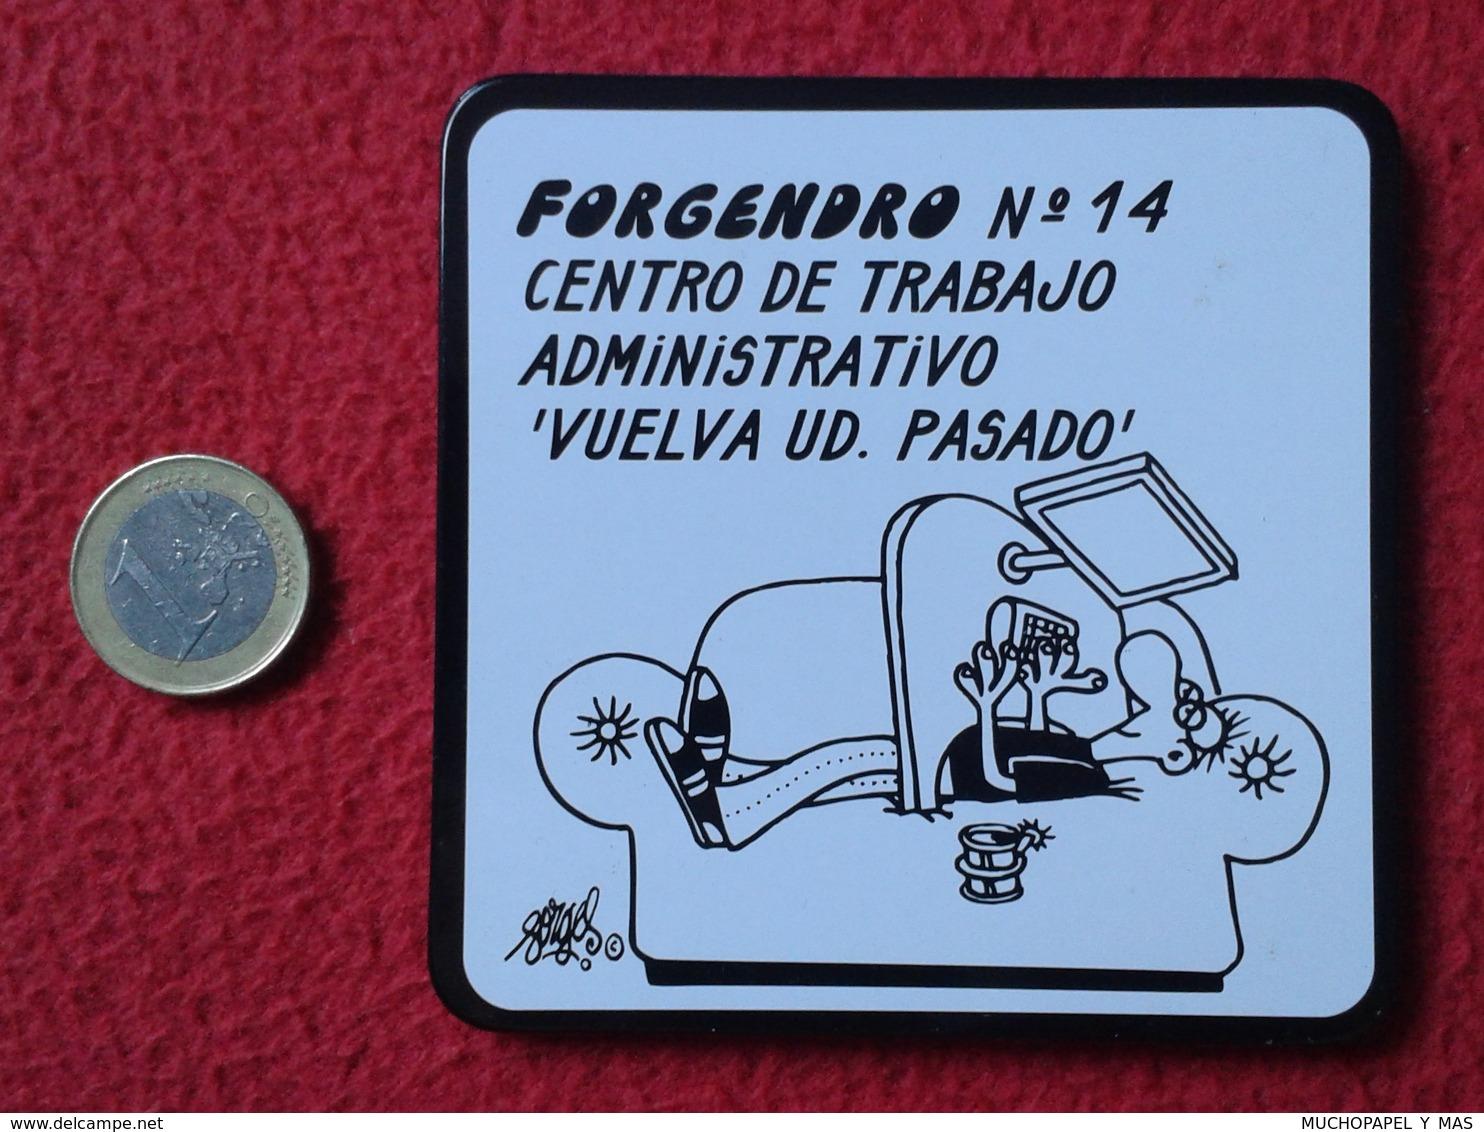 SPAIN POSAVASOS COASTER MAT O SIMIL FORGENDRO FORGES DIBUJO Nº 14 HOMBRE EN SOFÁ CENTRO DE TRABAJO HUMOR HUMOUR HUMOROUS - Portavasos